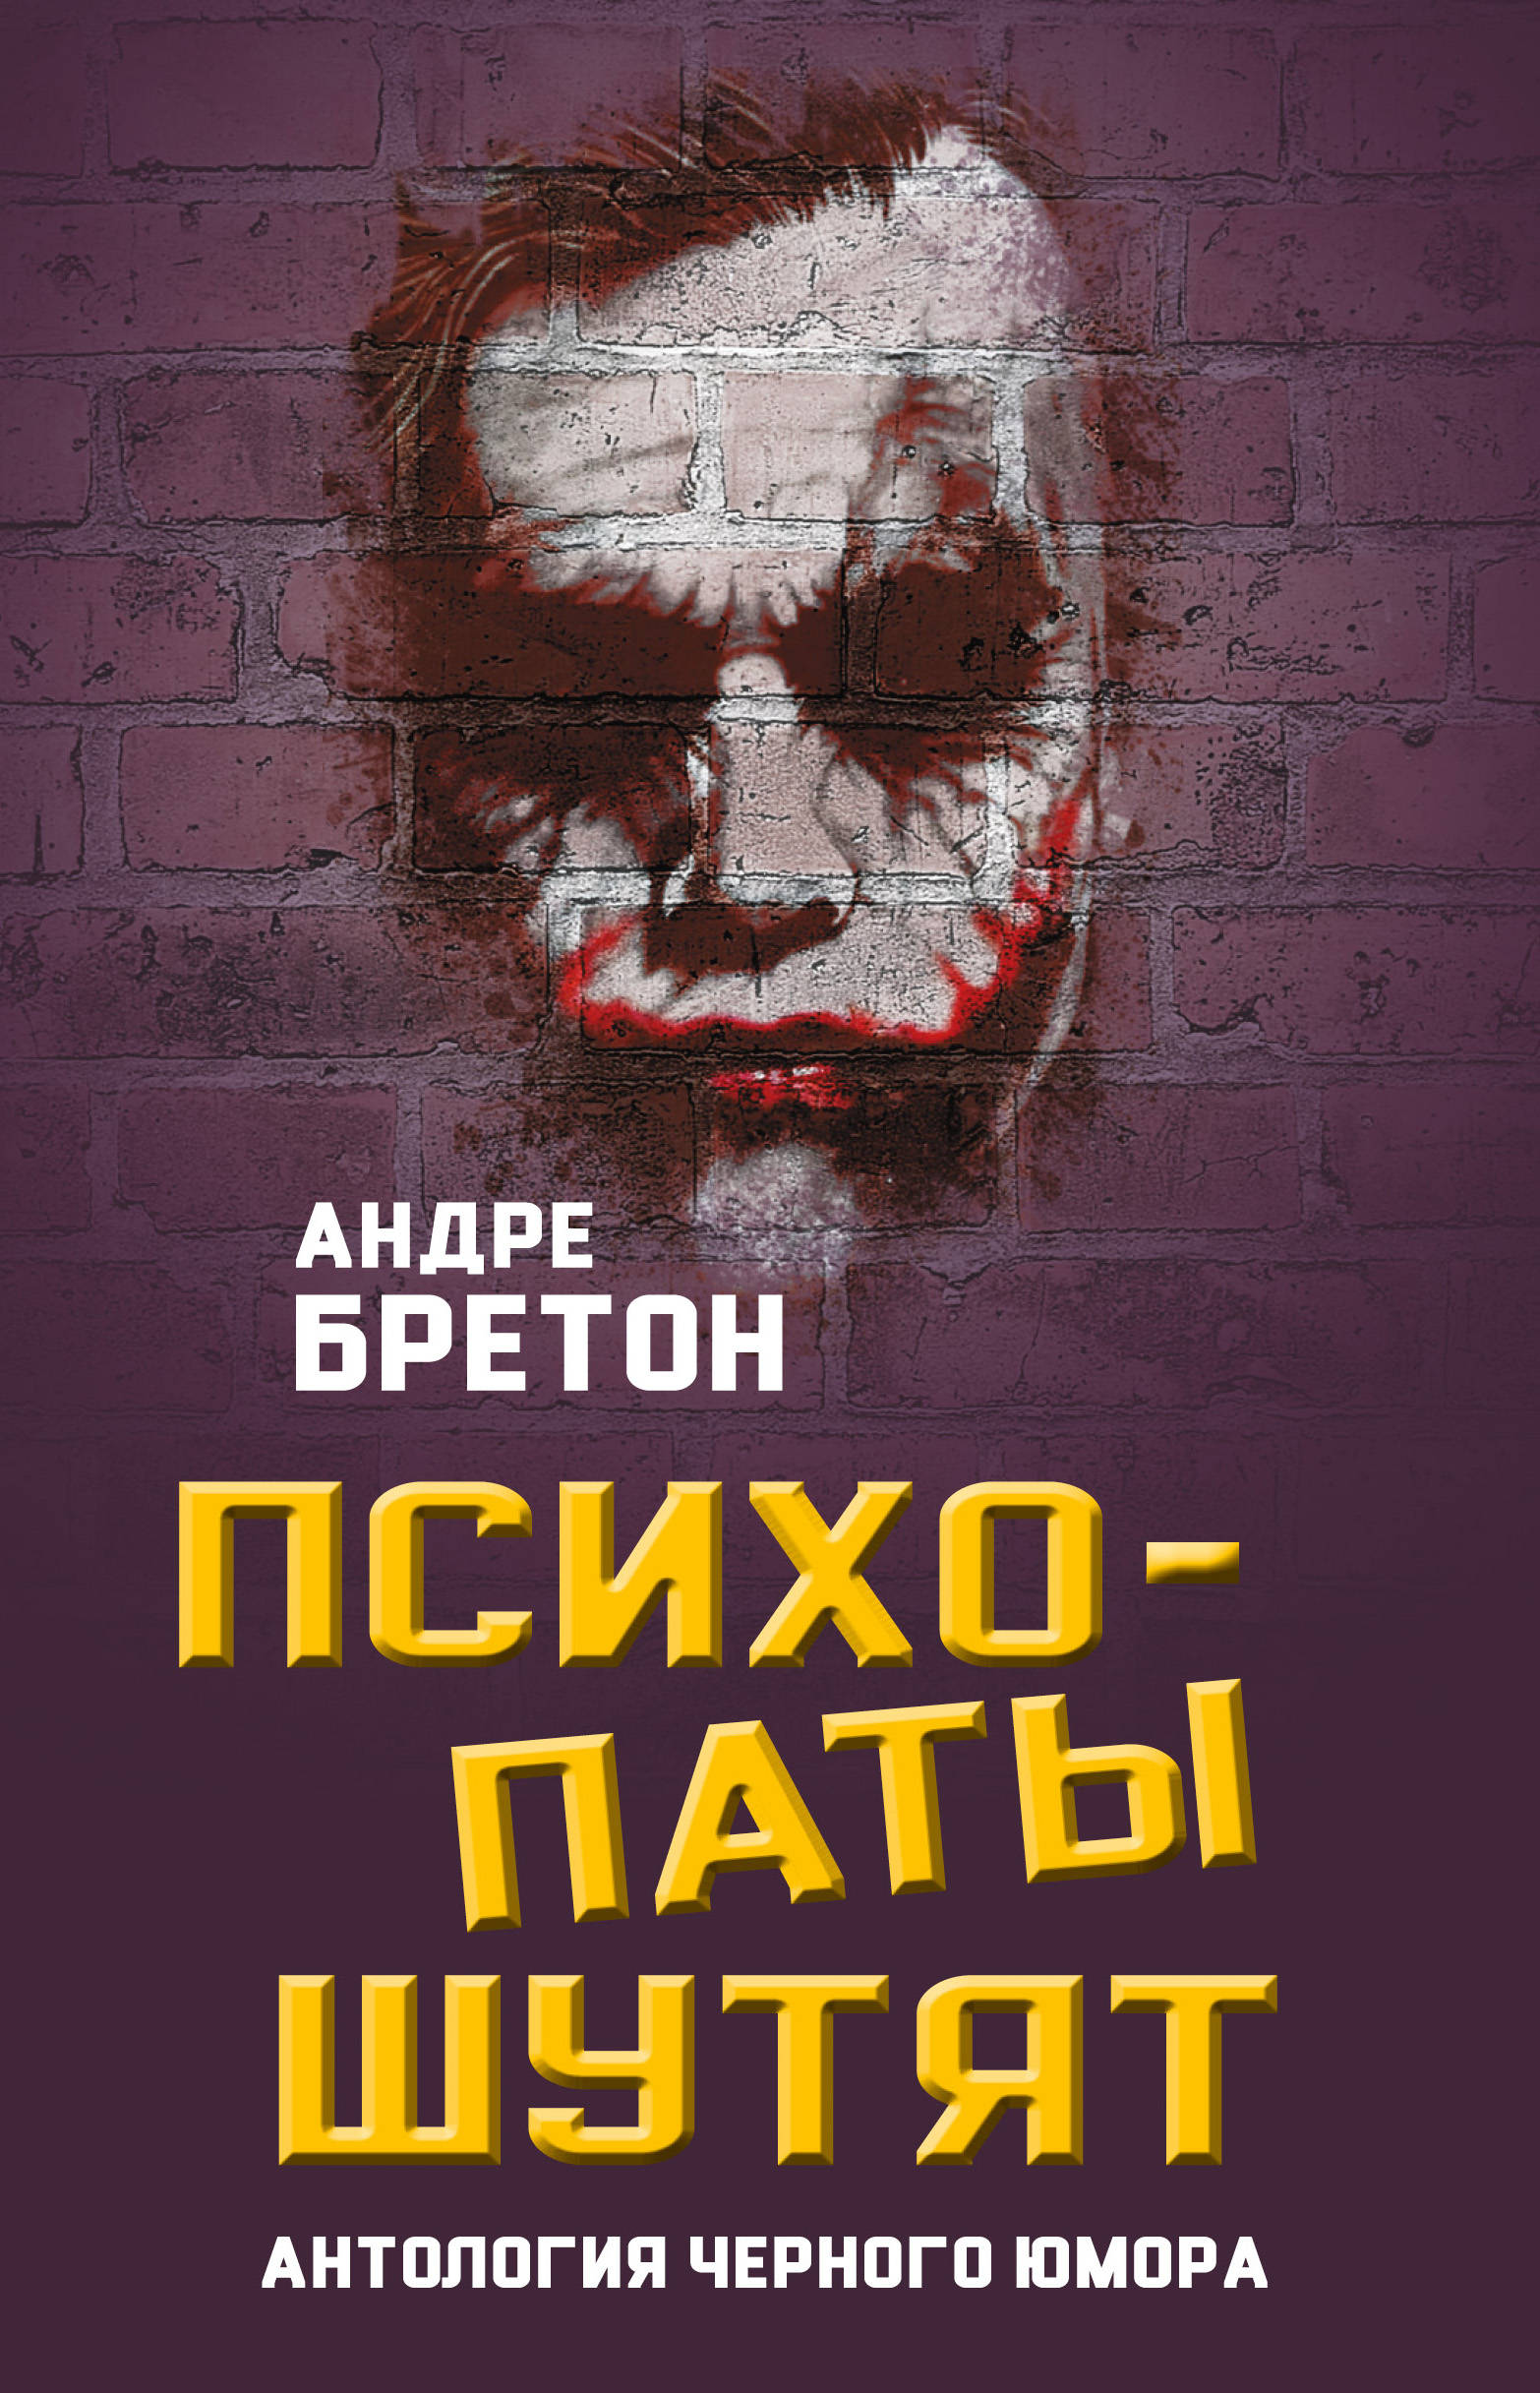 Андре Бретон Психопаты шутят. Антология черного юмора